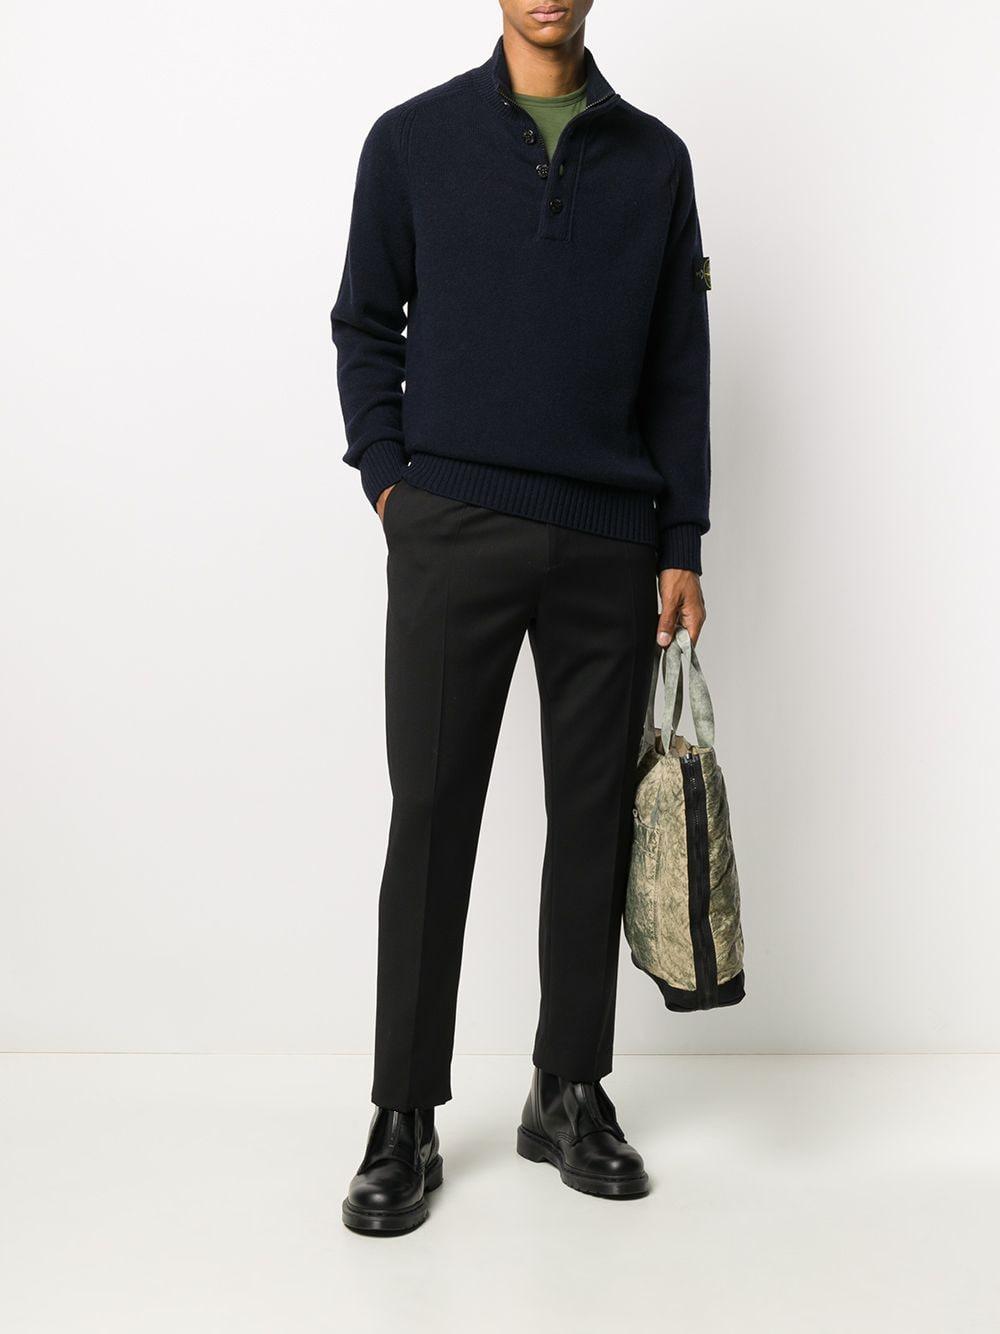 Midnight blue wool-blend jumper  featuring mock neck STONE ISLAND |  | 7315532A3V0020